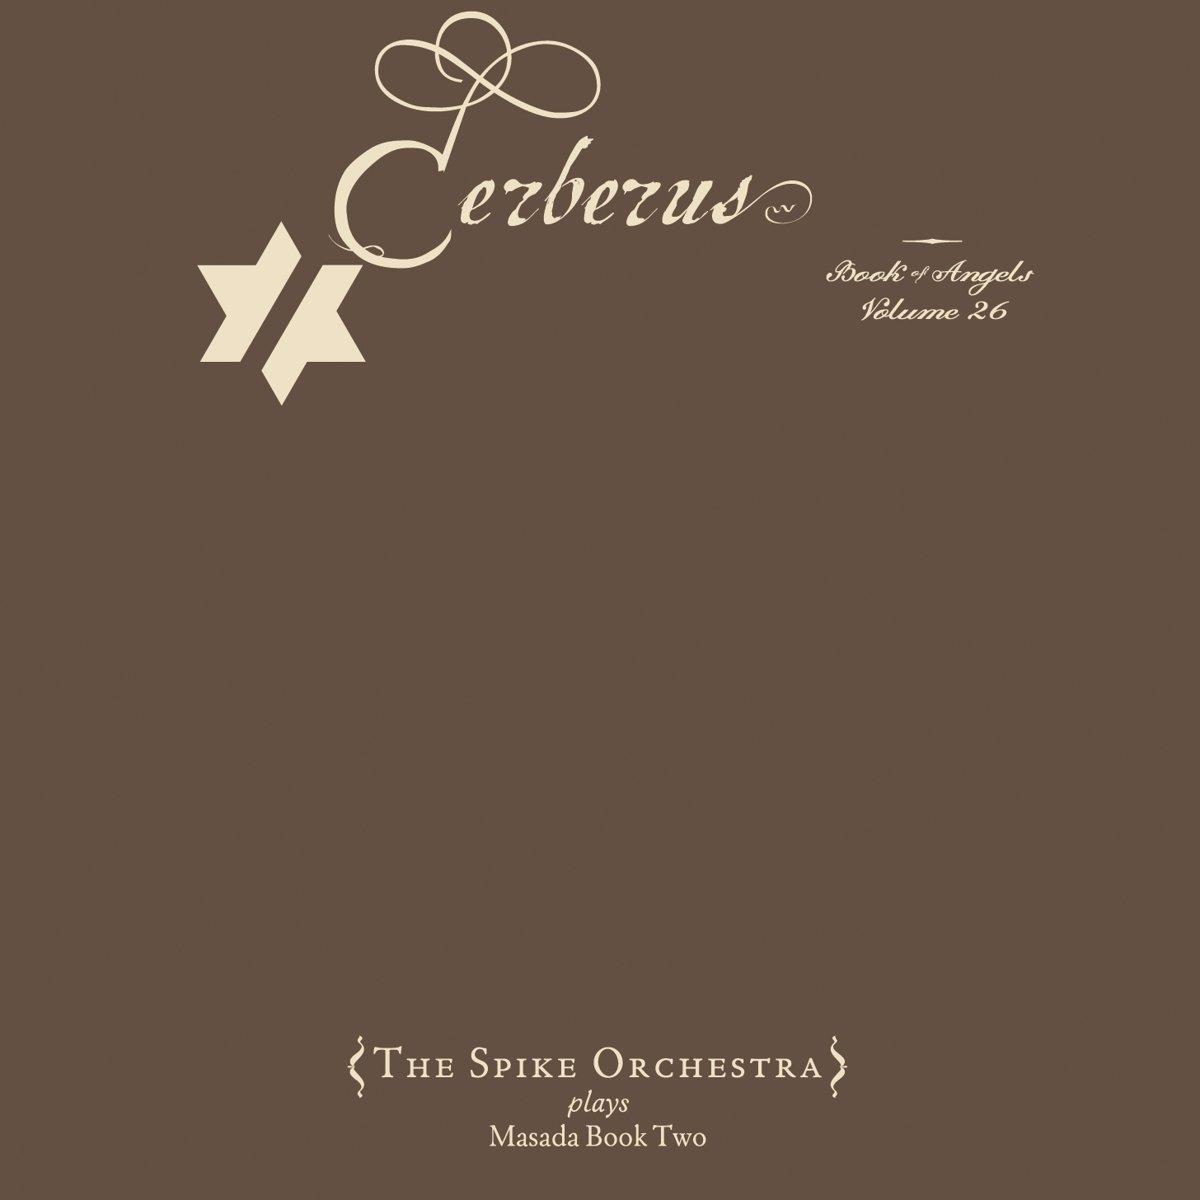 Cerberus: The Book of Angels Volume 26